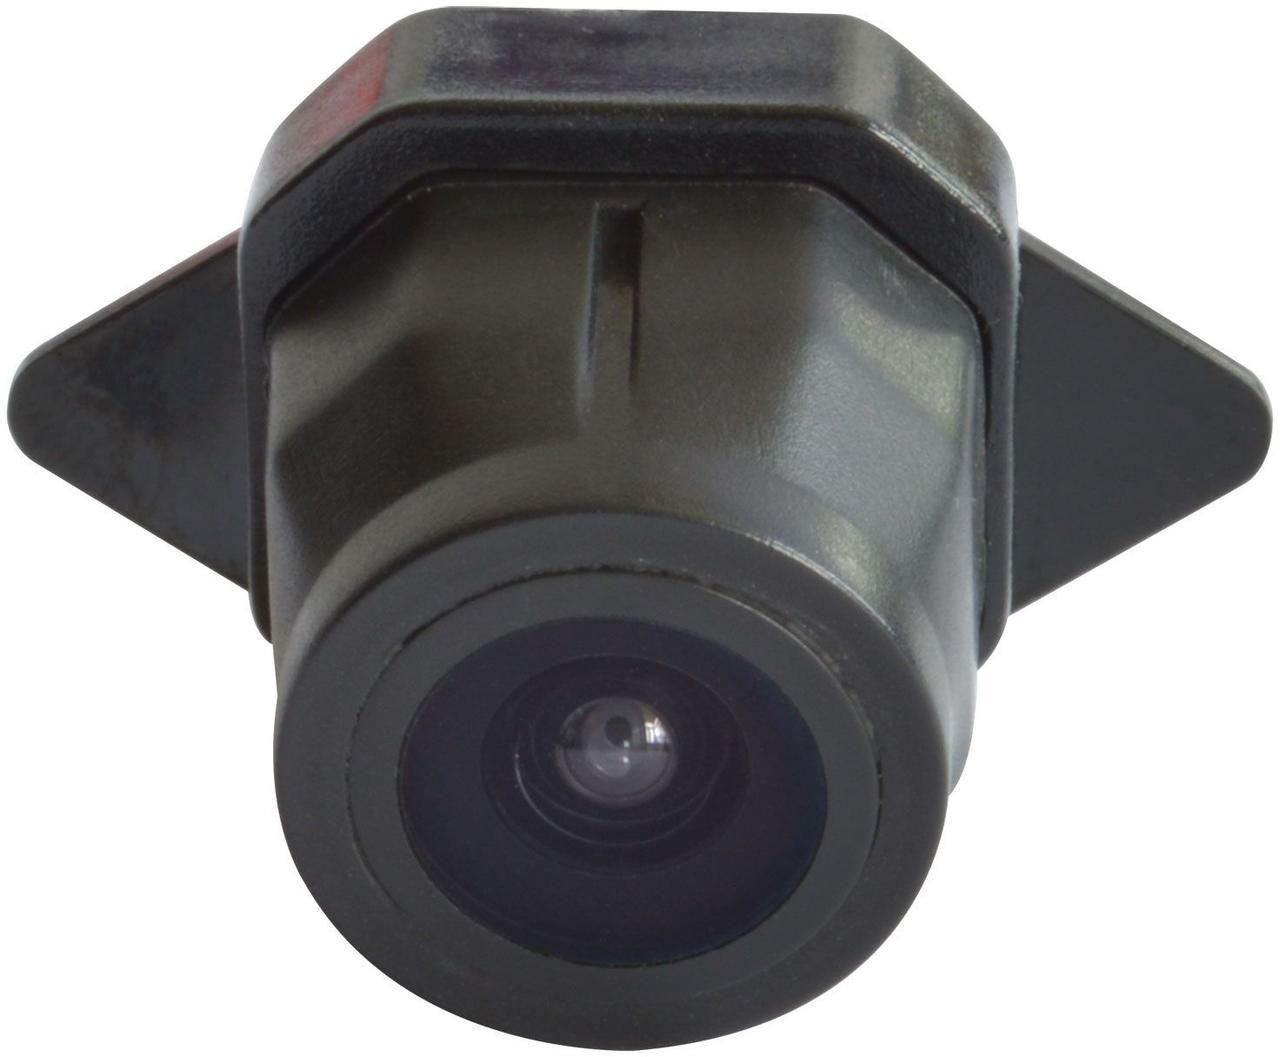 Камера переднего вида Prime-X A8014 для Mercedes E Class 2012+